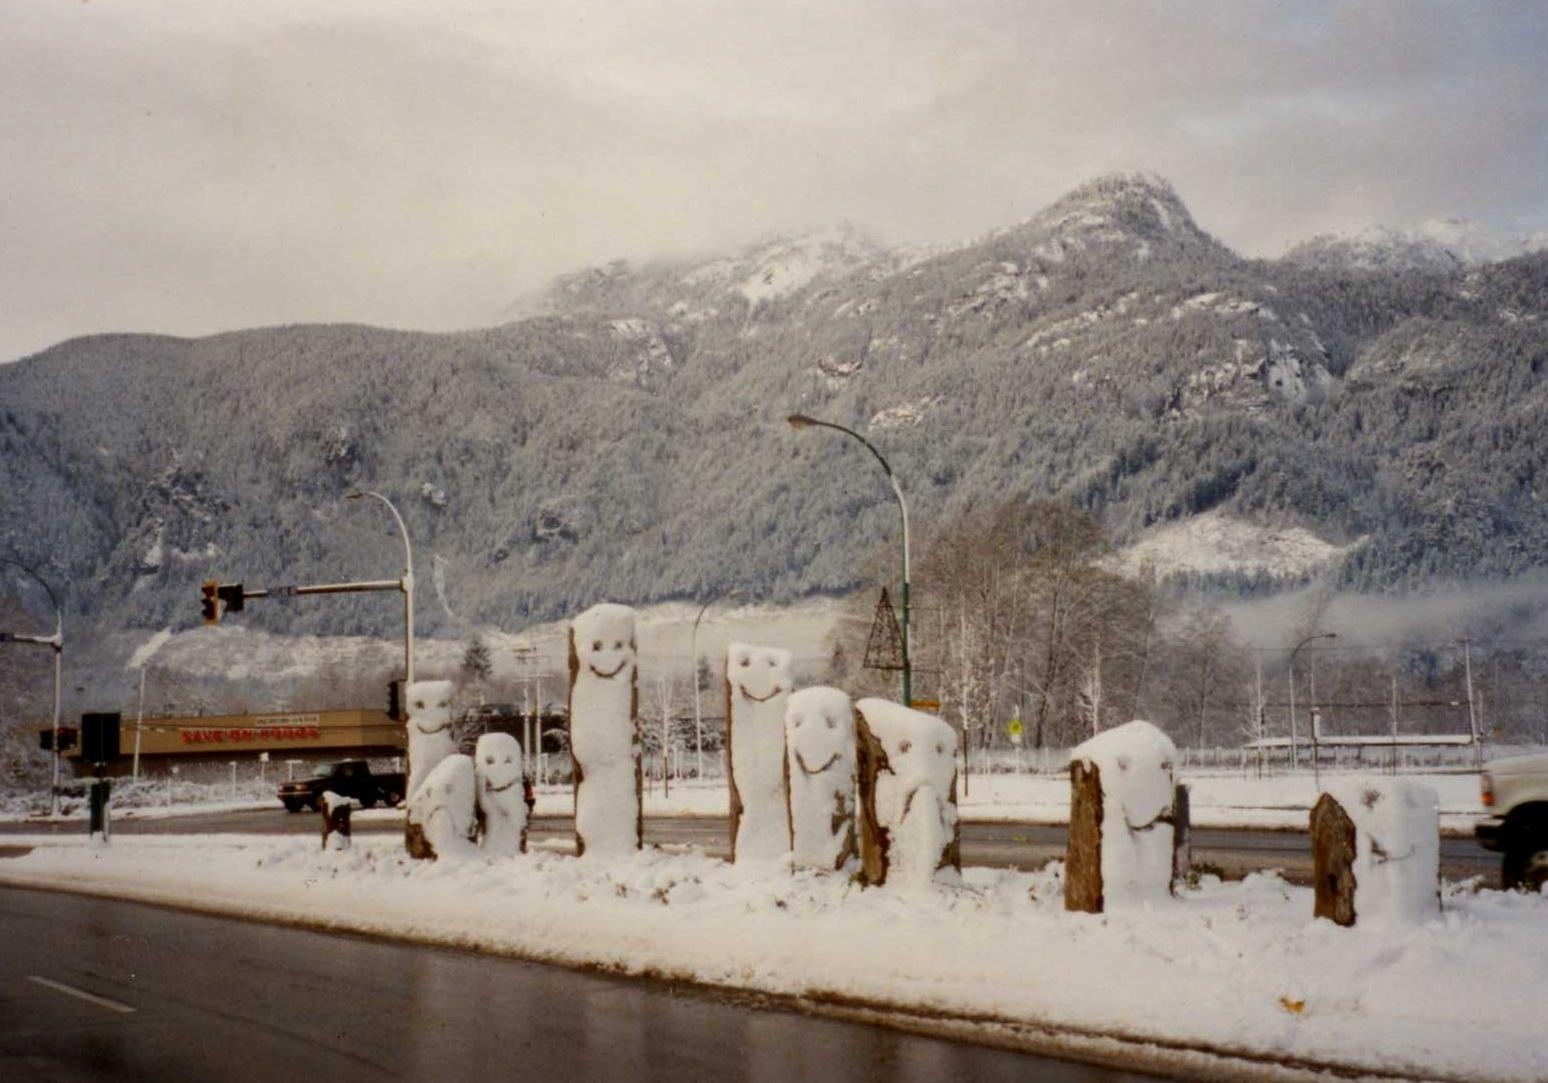 Squamih Snow Gnomes awaiting 2010